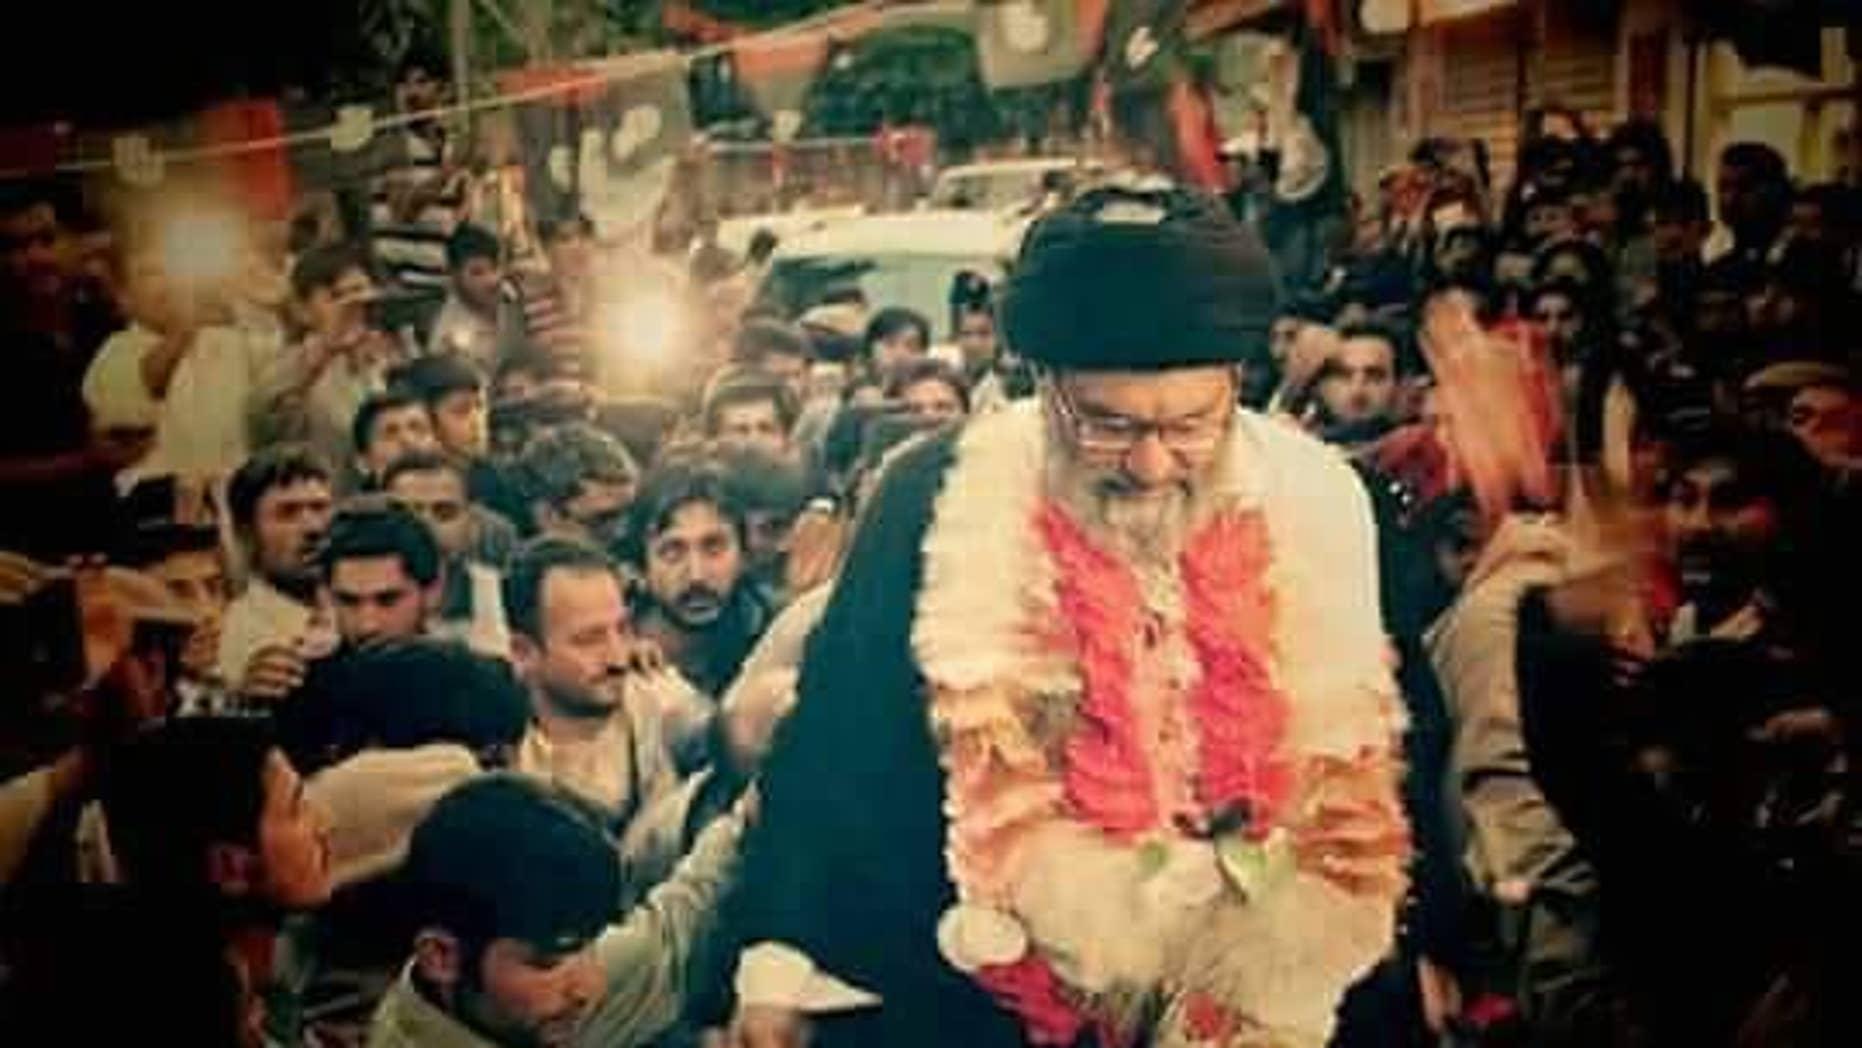 Supreme Leader Ali Khamenei of Iran,  alongside members of Pakistan's Shiite political party, Tahrik-e-Jafaria Pakistan (TJP).